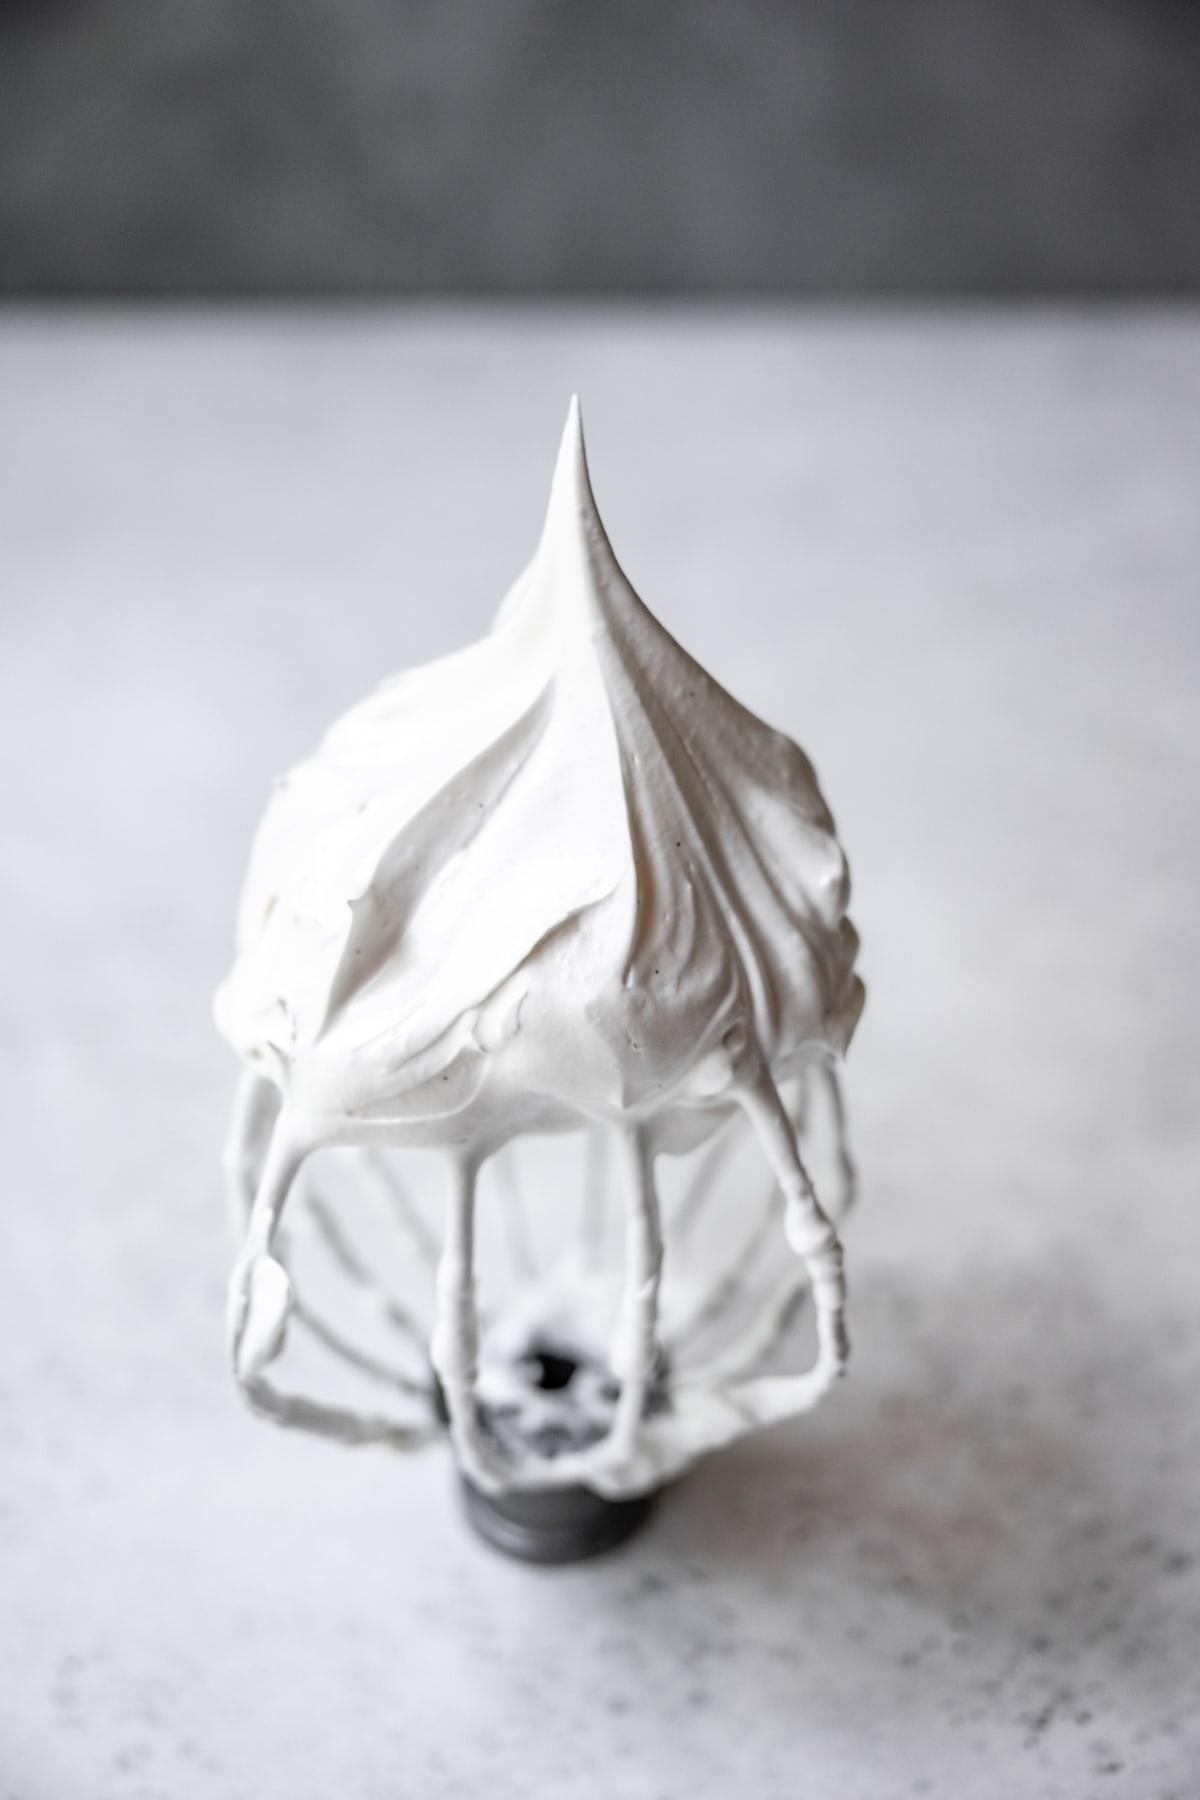 vegan meringue on a whisk attachment